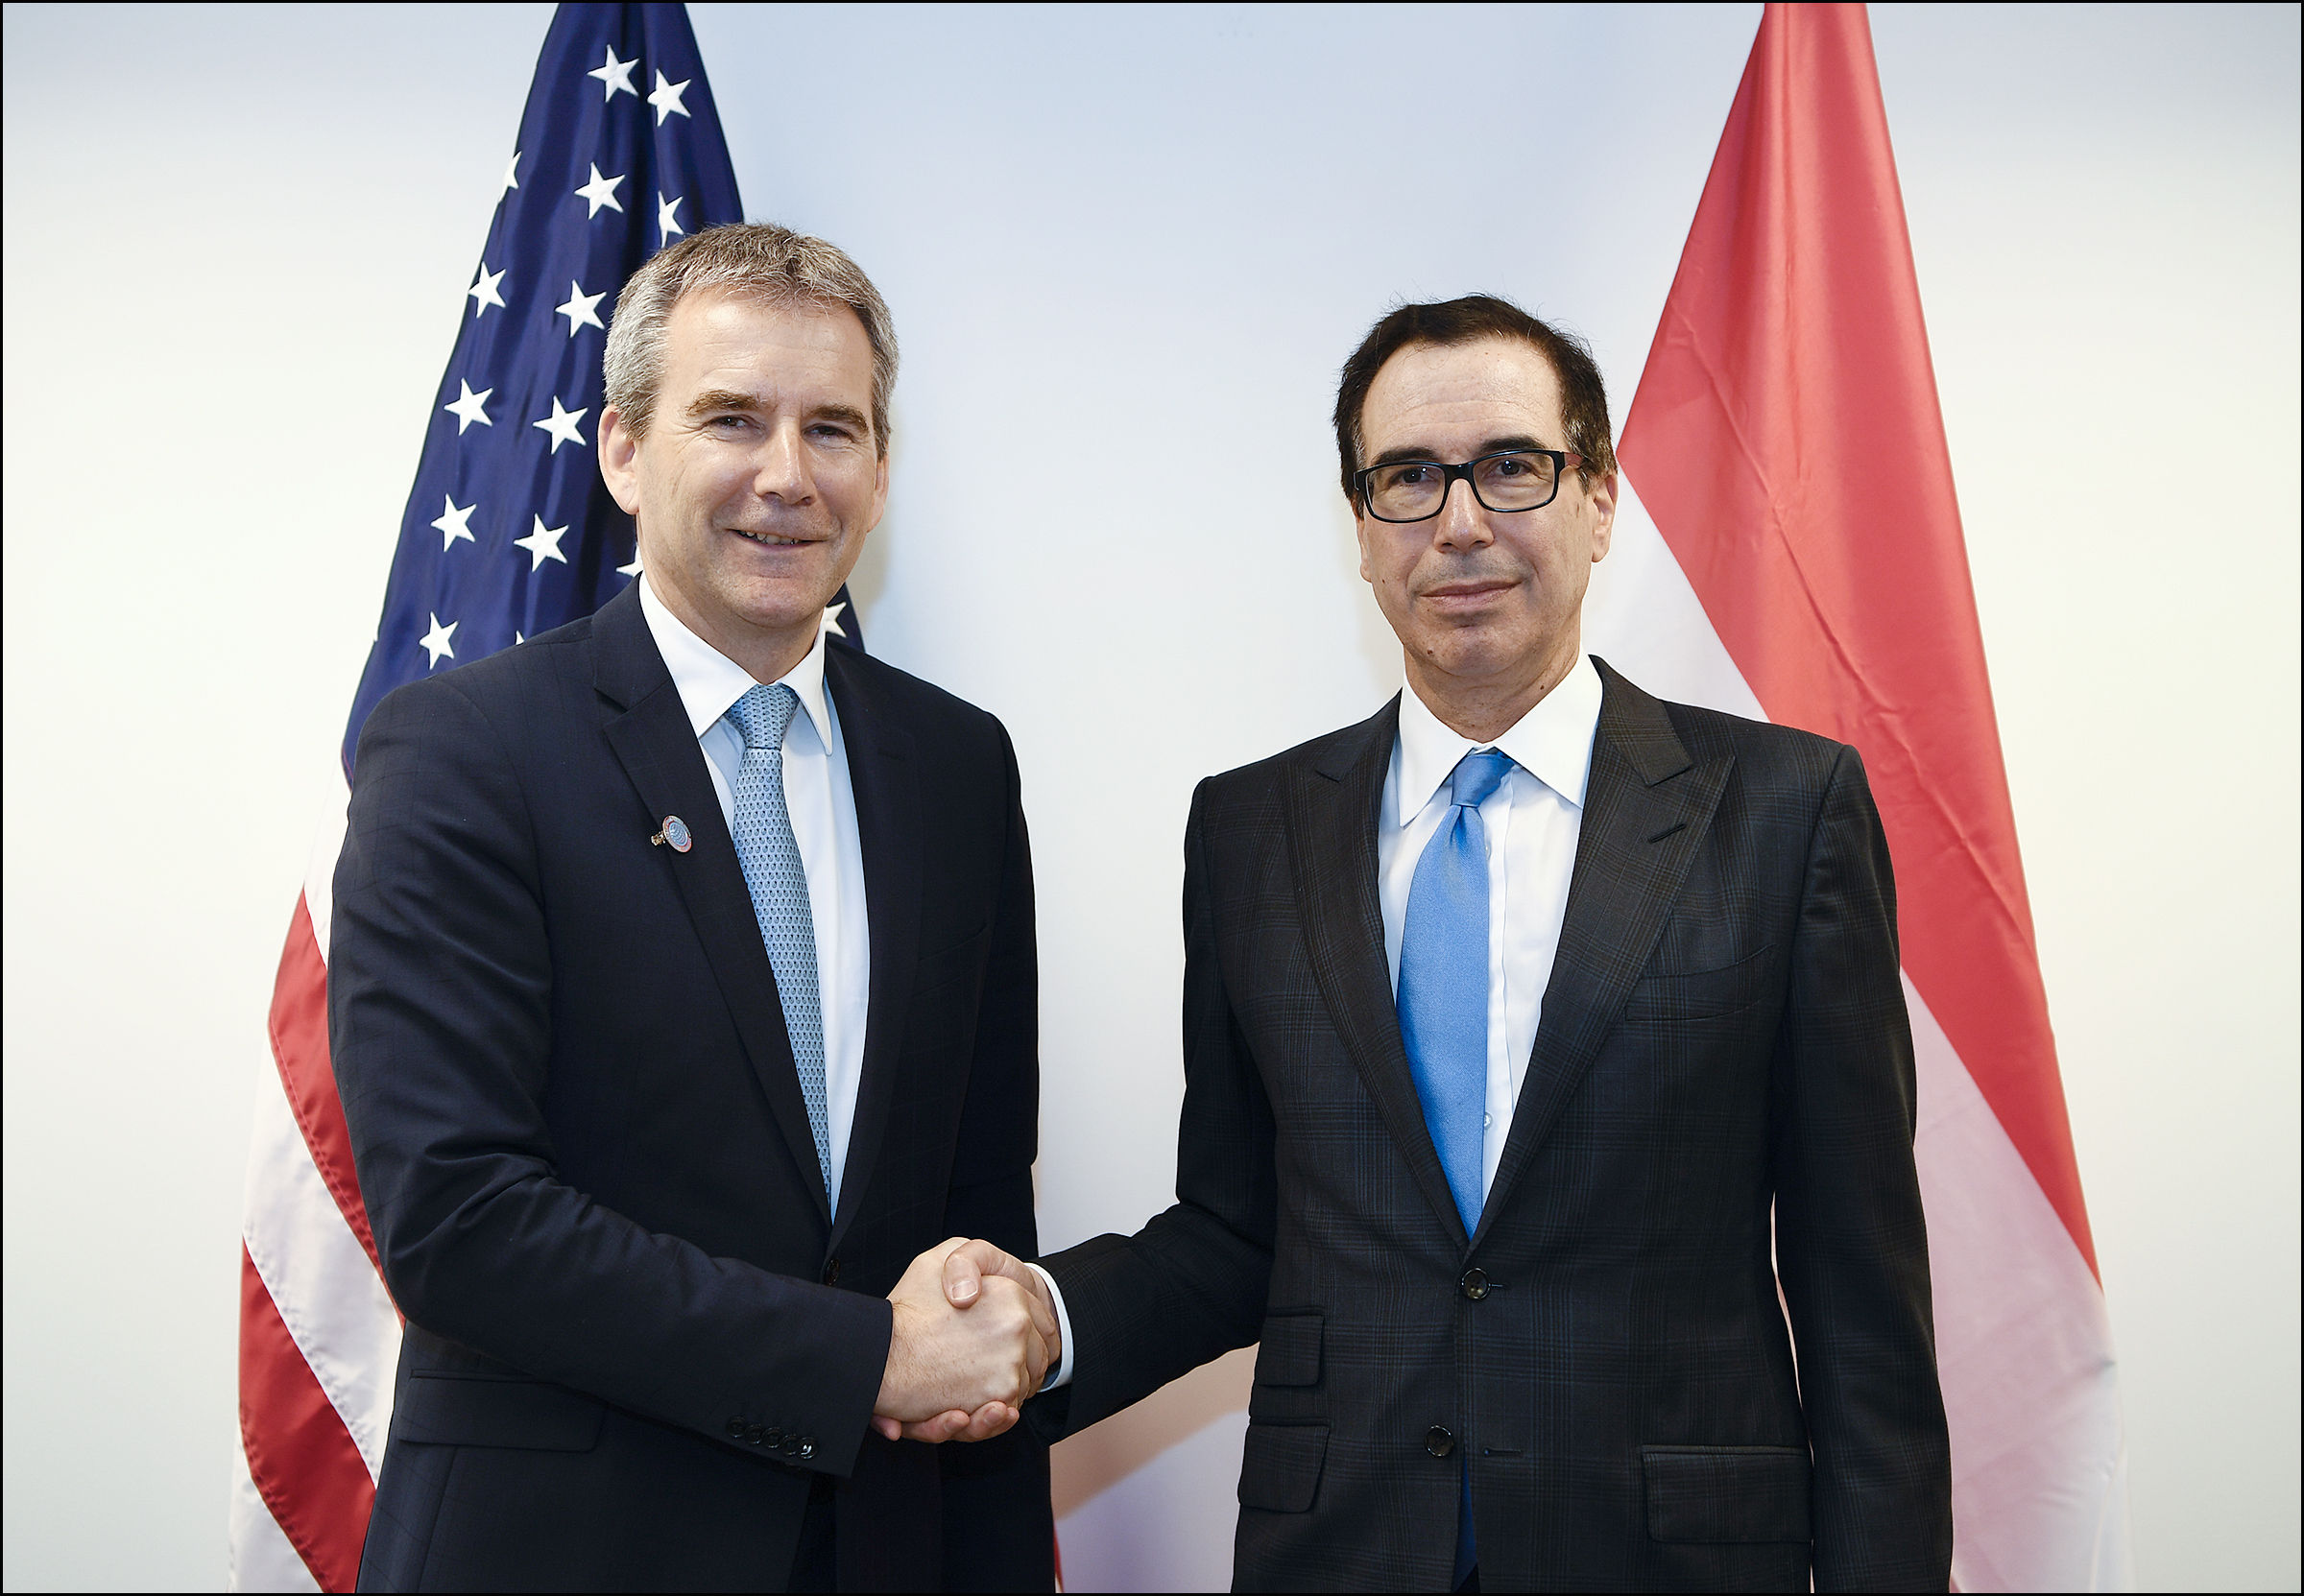 Austrian Finance Minister Hartwig Löger with U.S. Treasury Secretary Steven Mnuchin (c) U.S. Department of the Treasury Photographer